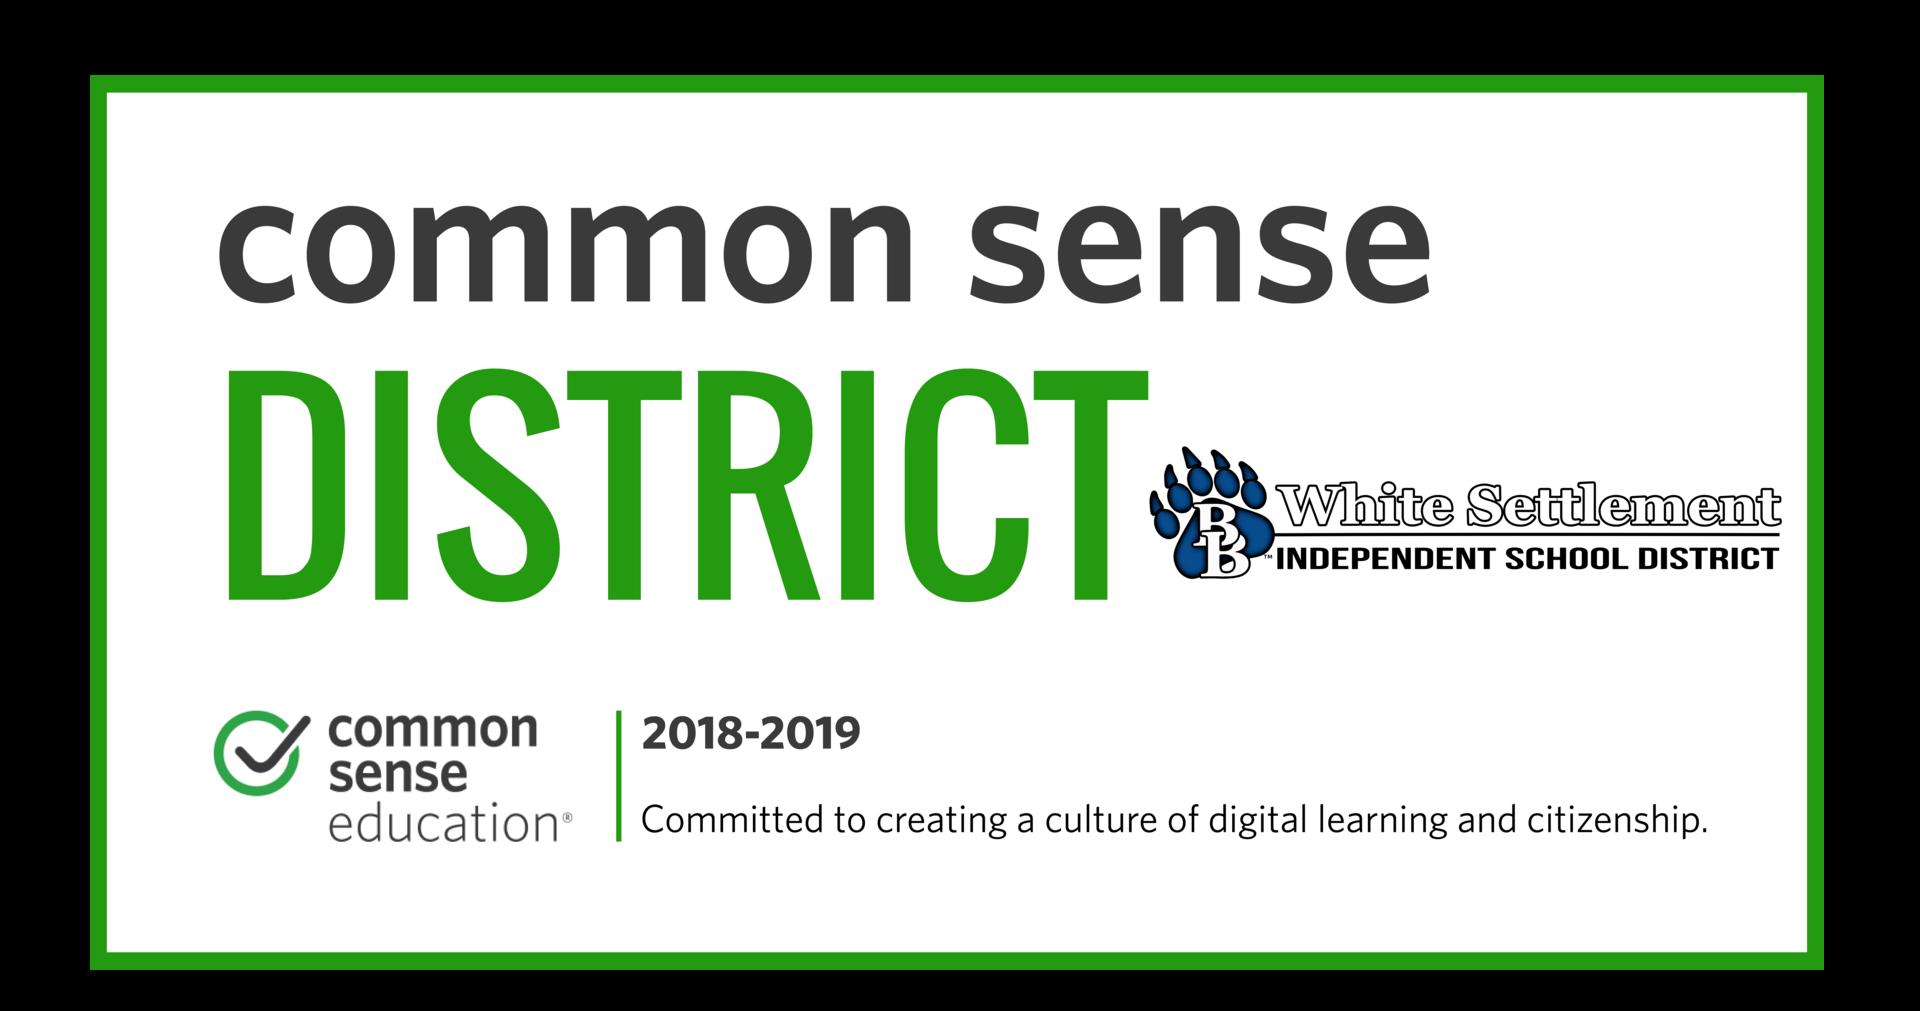 Common Sense District